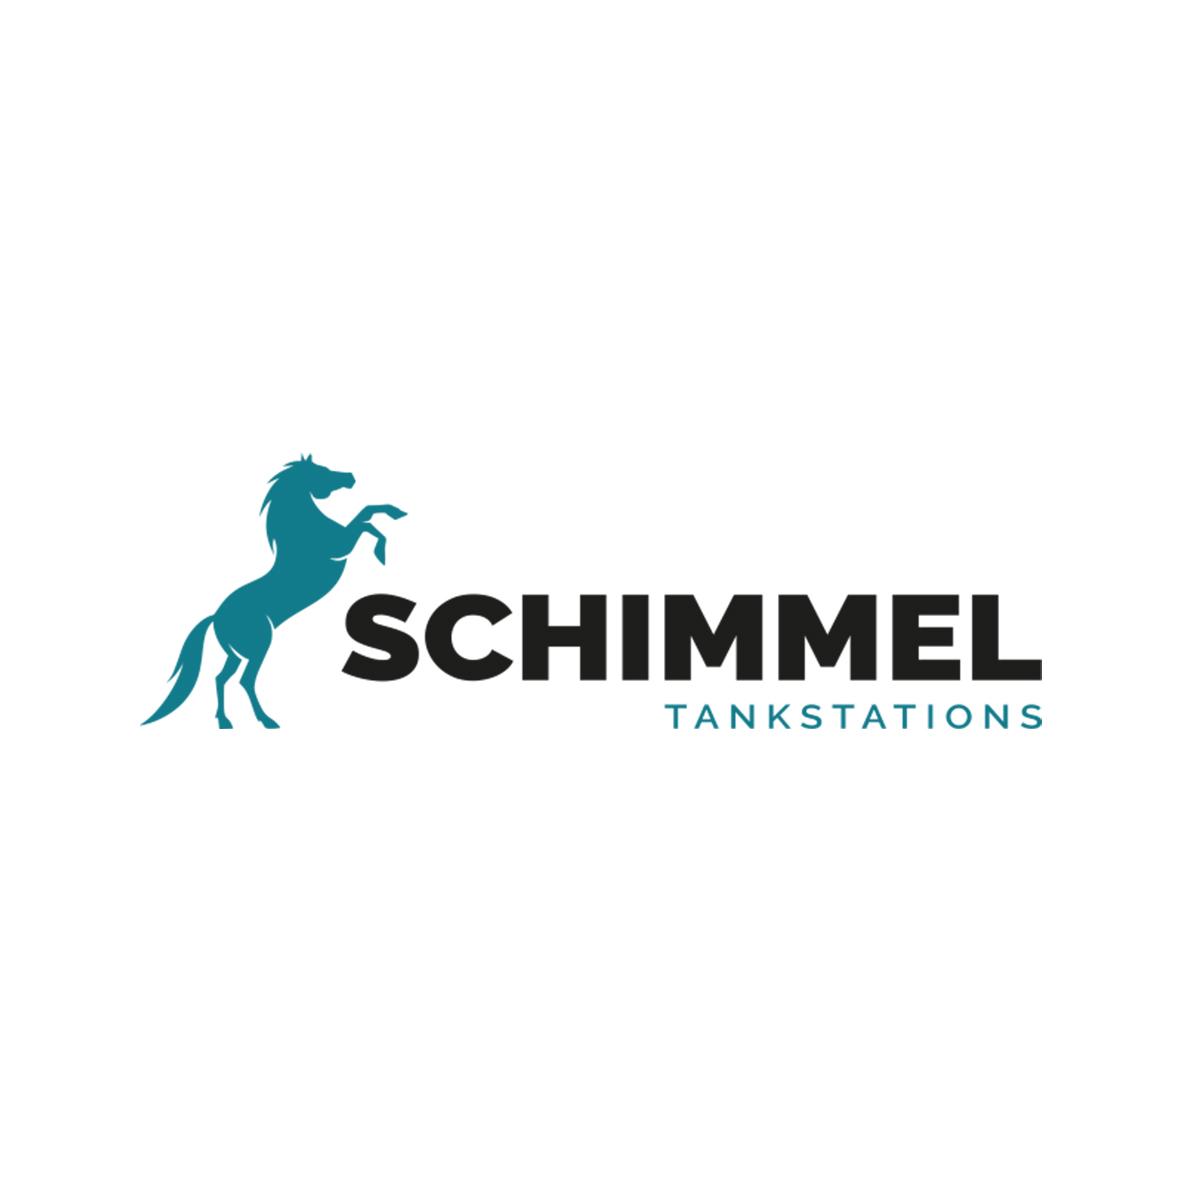 Schimmel_Tankstations